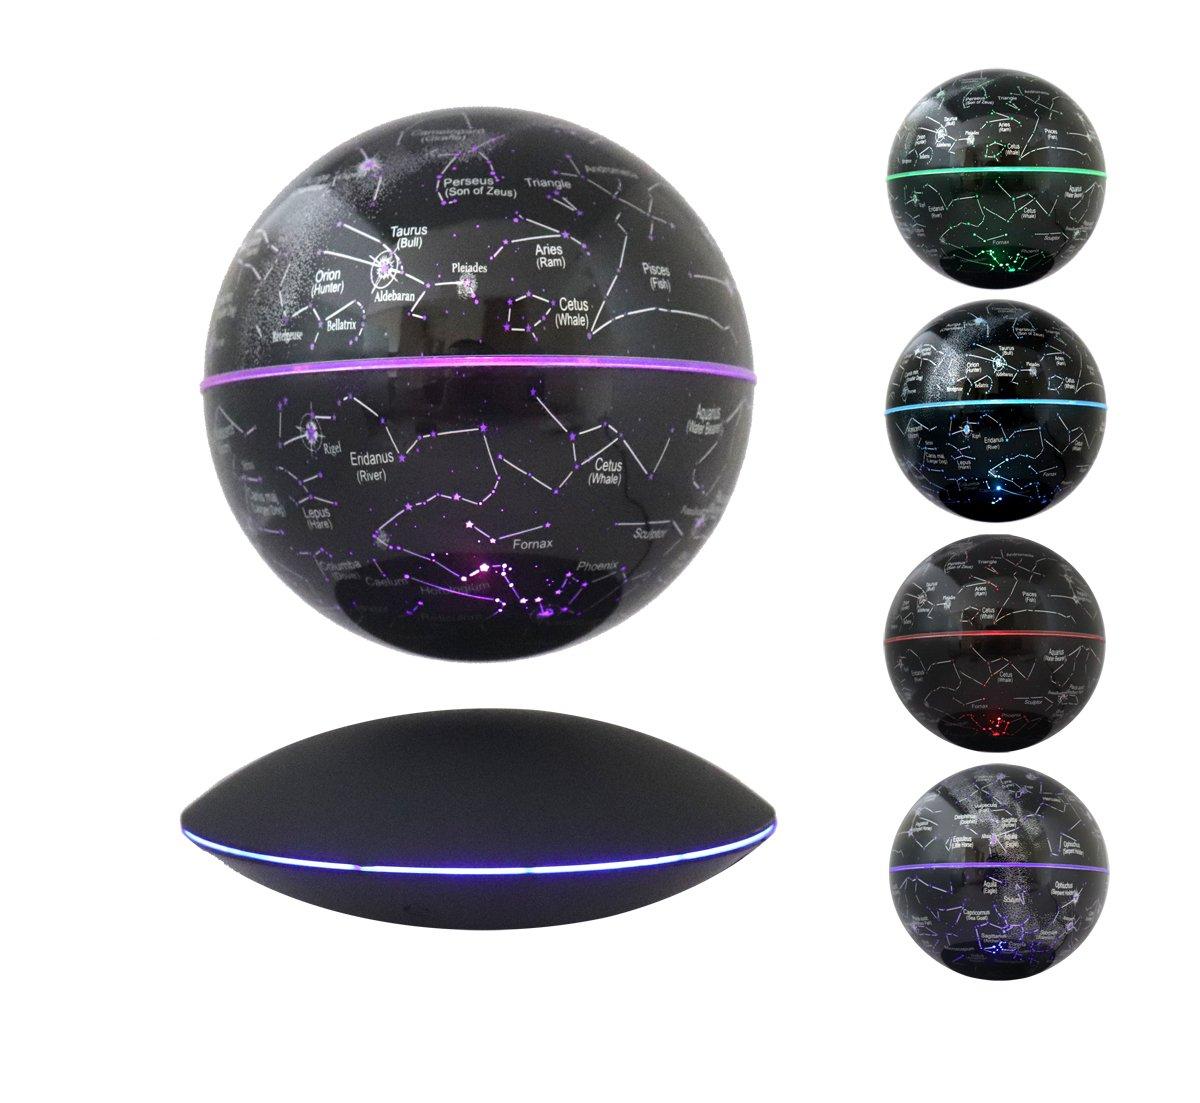 Floating Globe Magnetic Maglev Levitating Levitation Globe Rotating 7-Color LED Change Induction Globe Black Platform Showcase Home Decor Display, by woodlev ¡